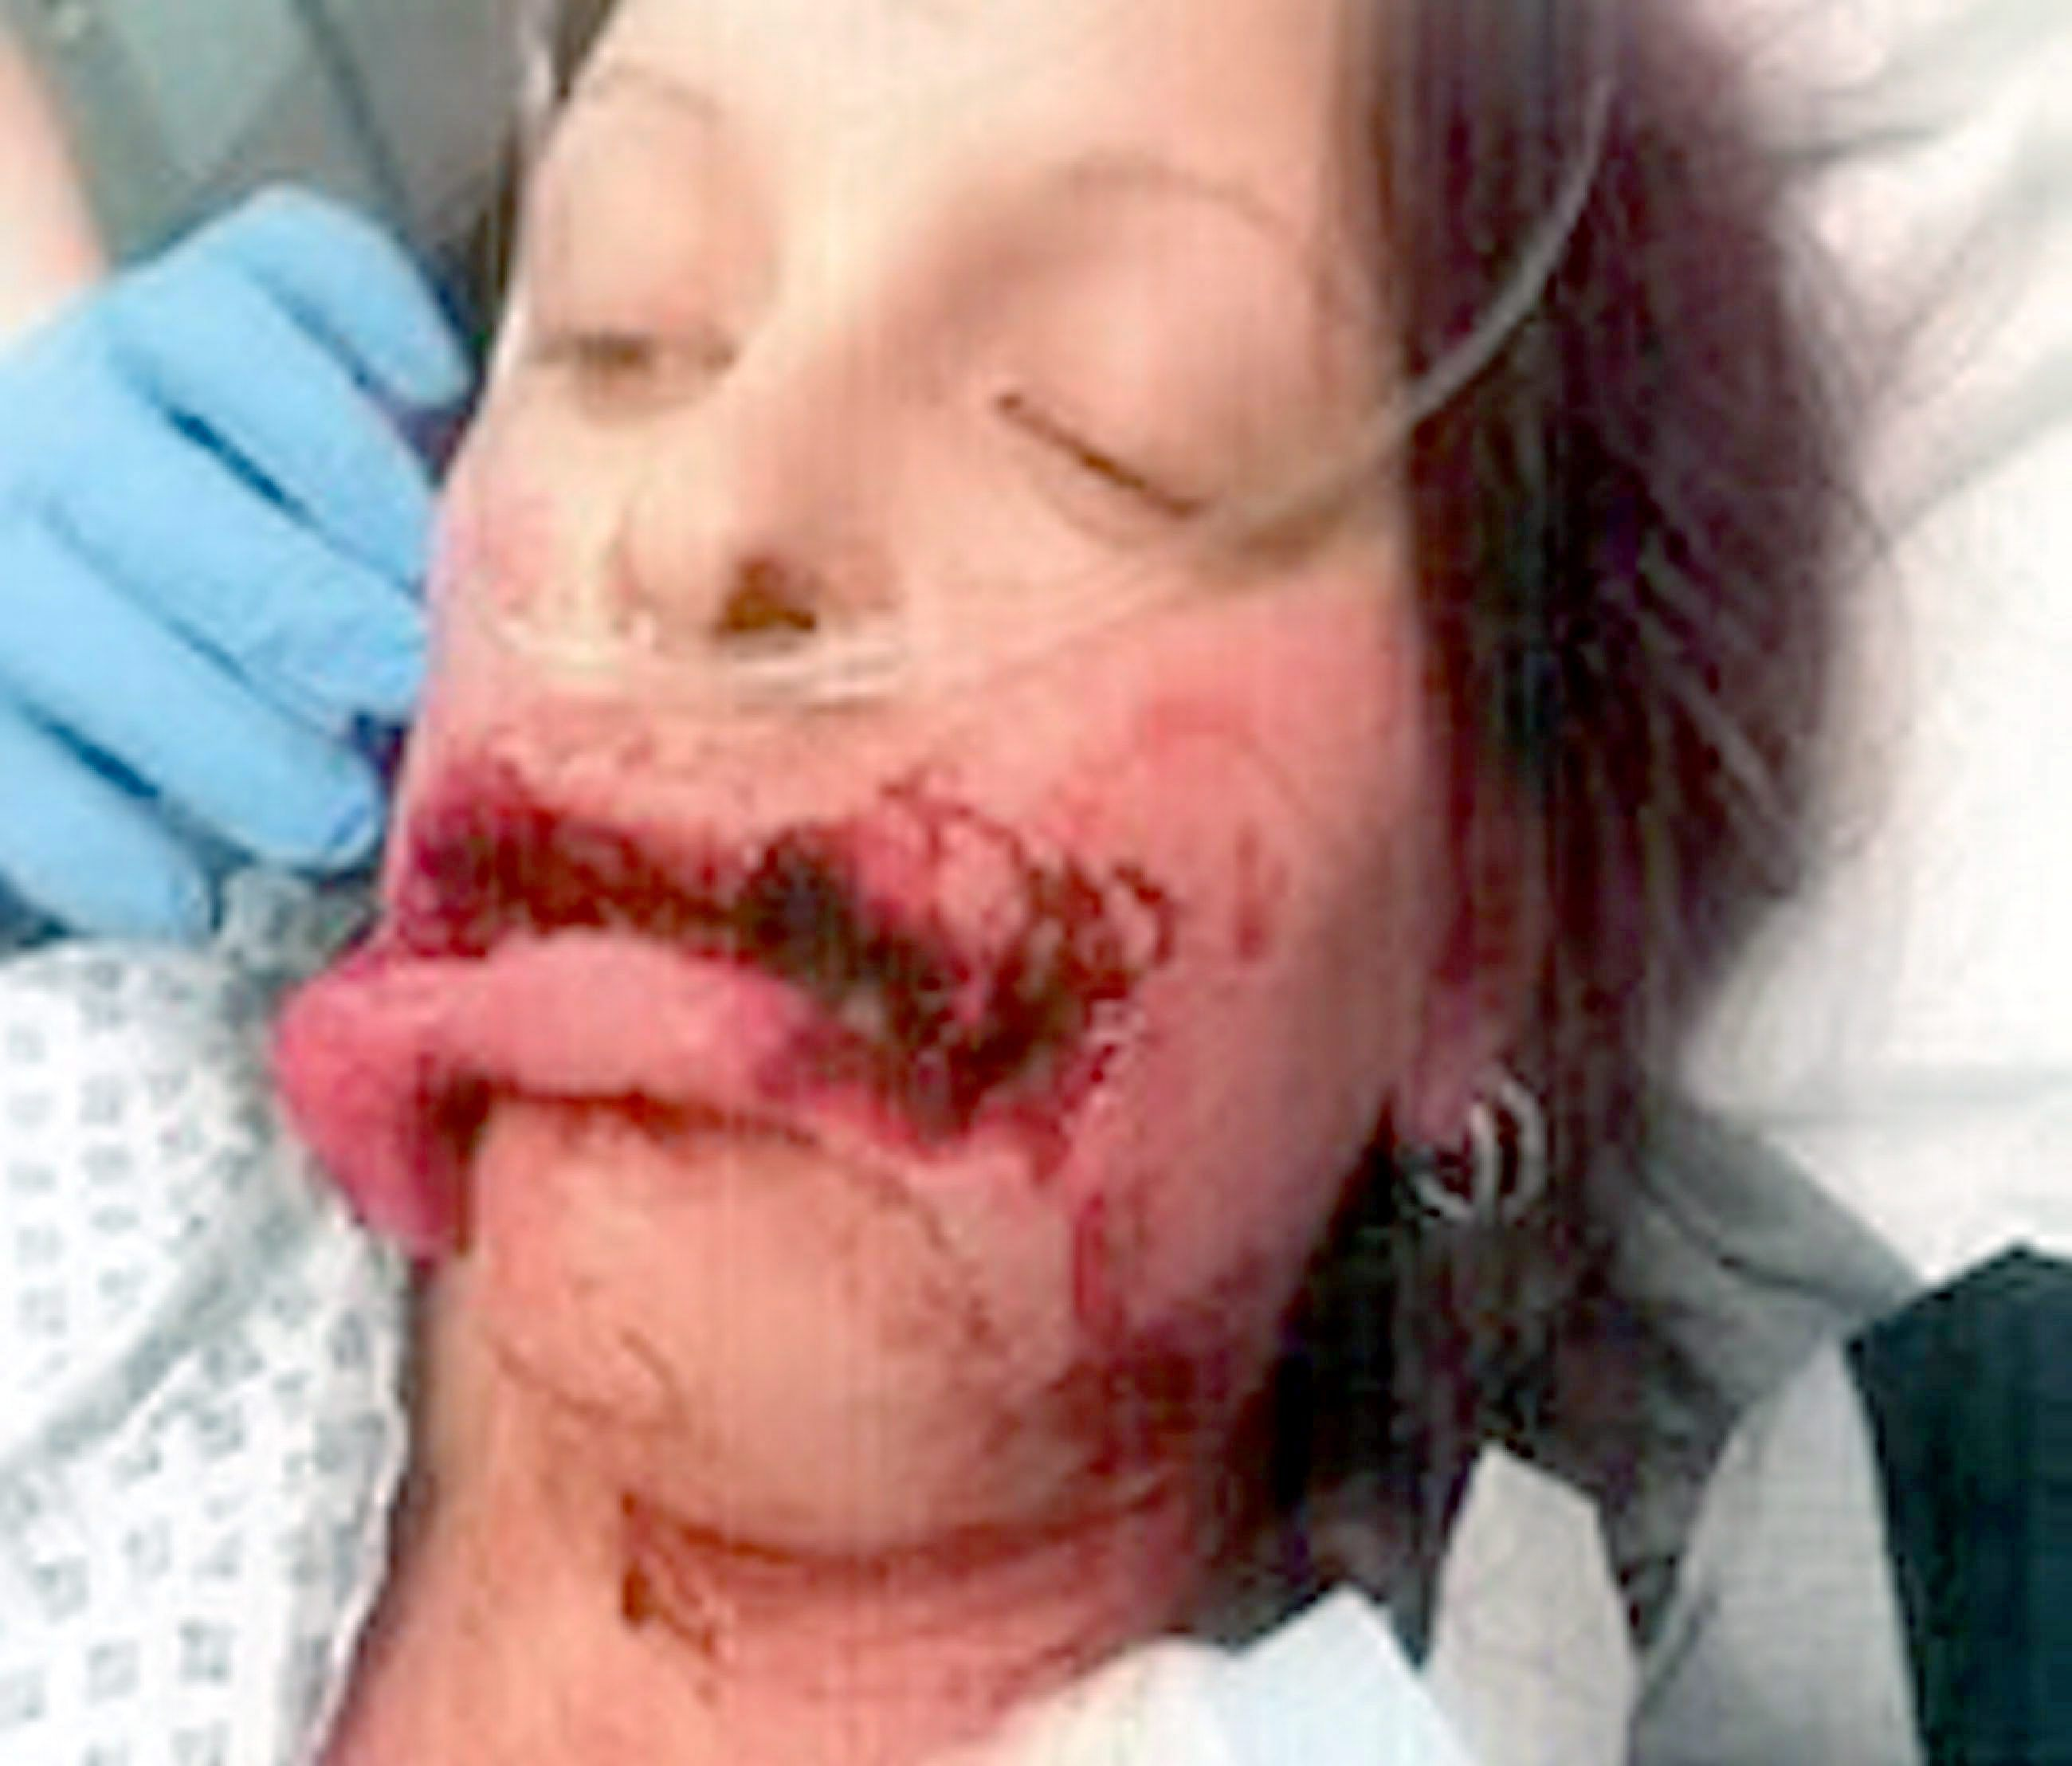 Horrific Dog Attack | Deformações em Humanos | Pinterest